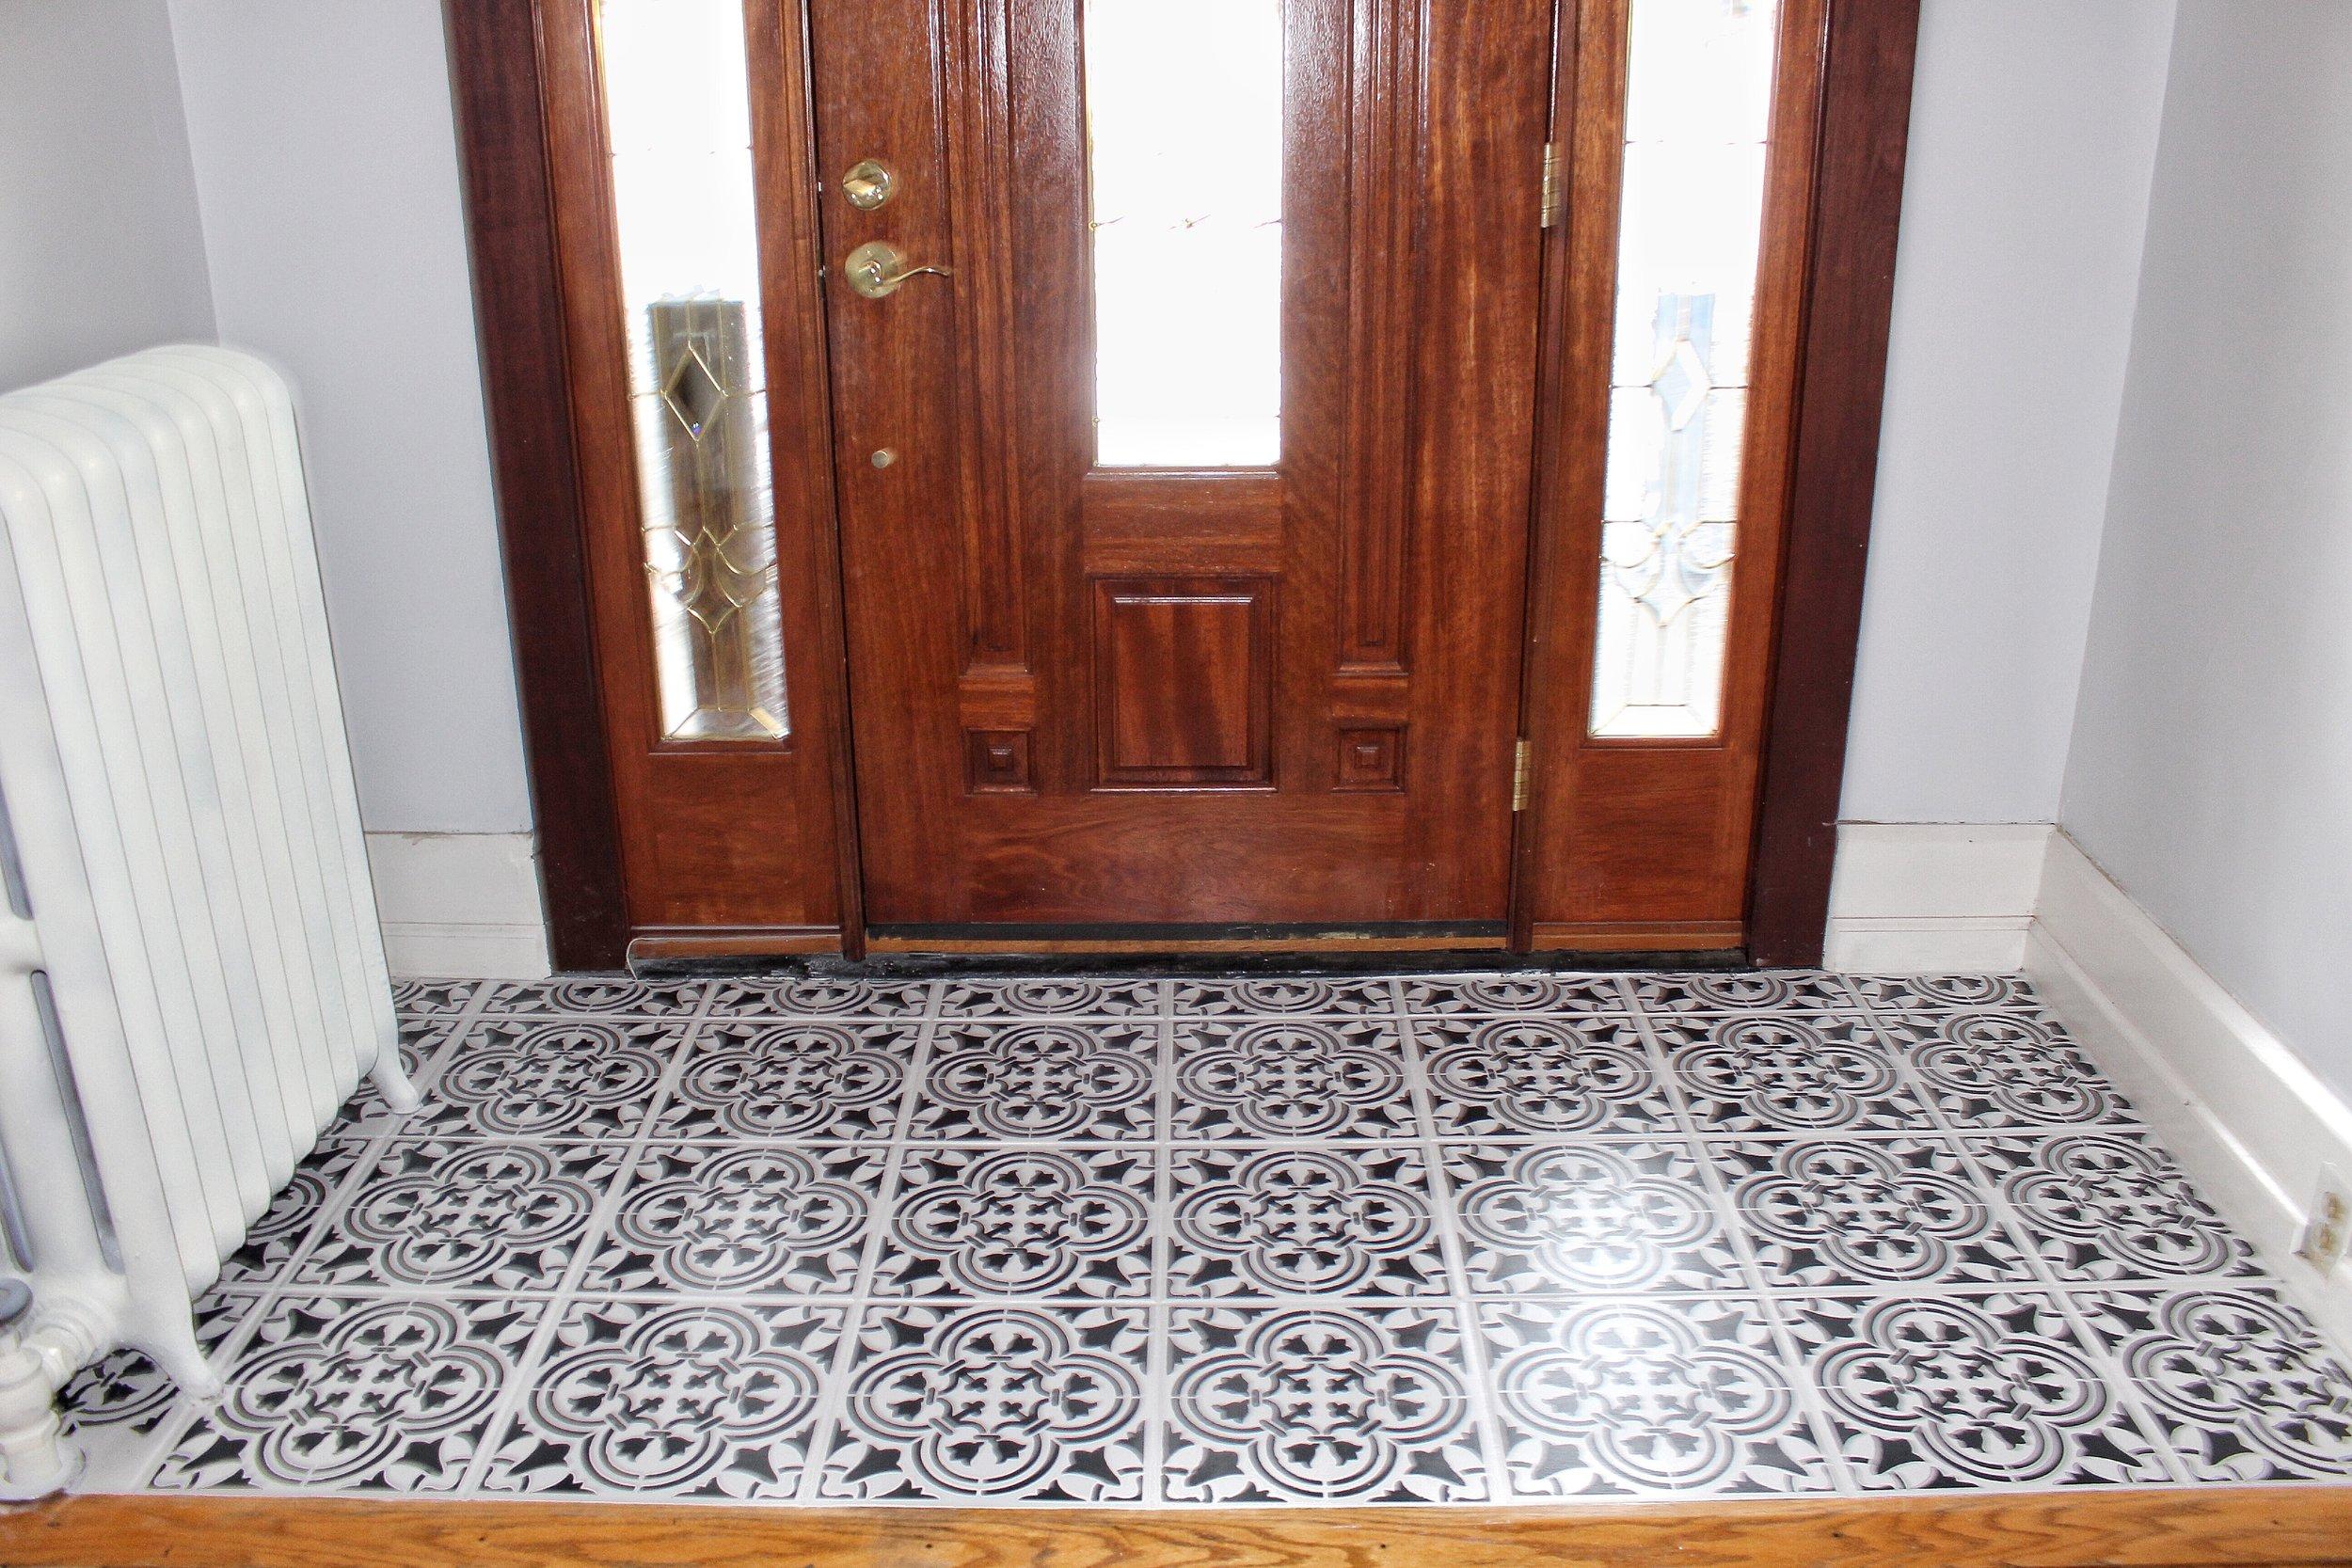 Close Up of tiles